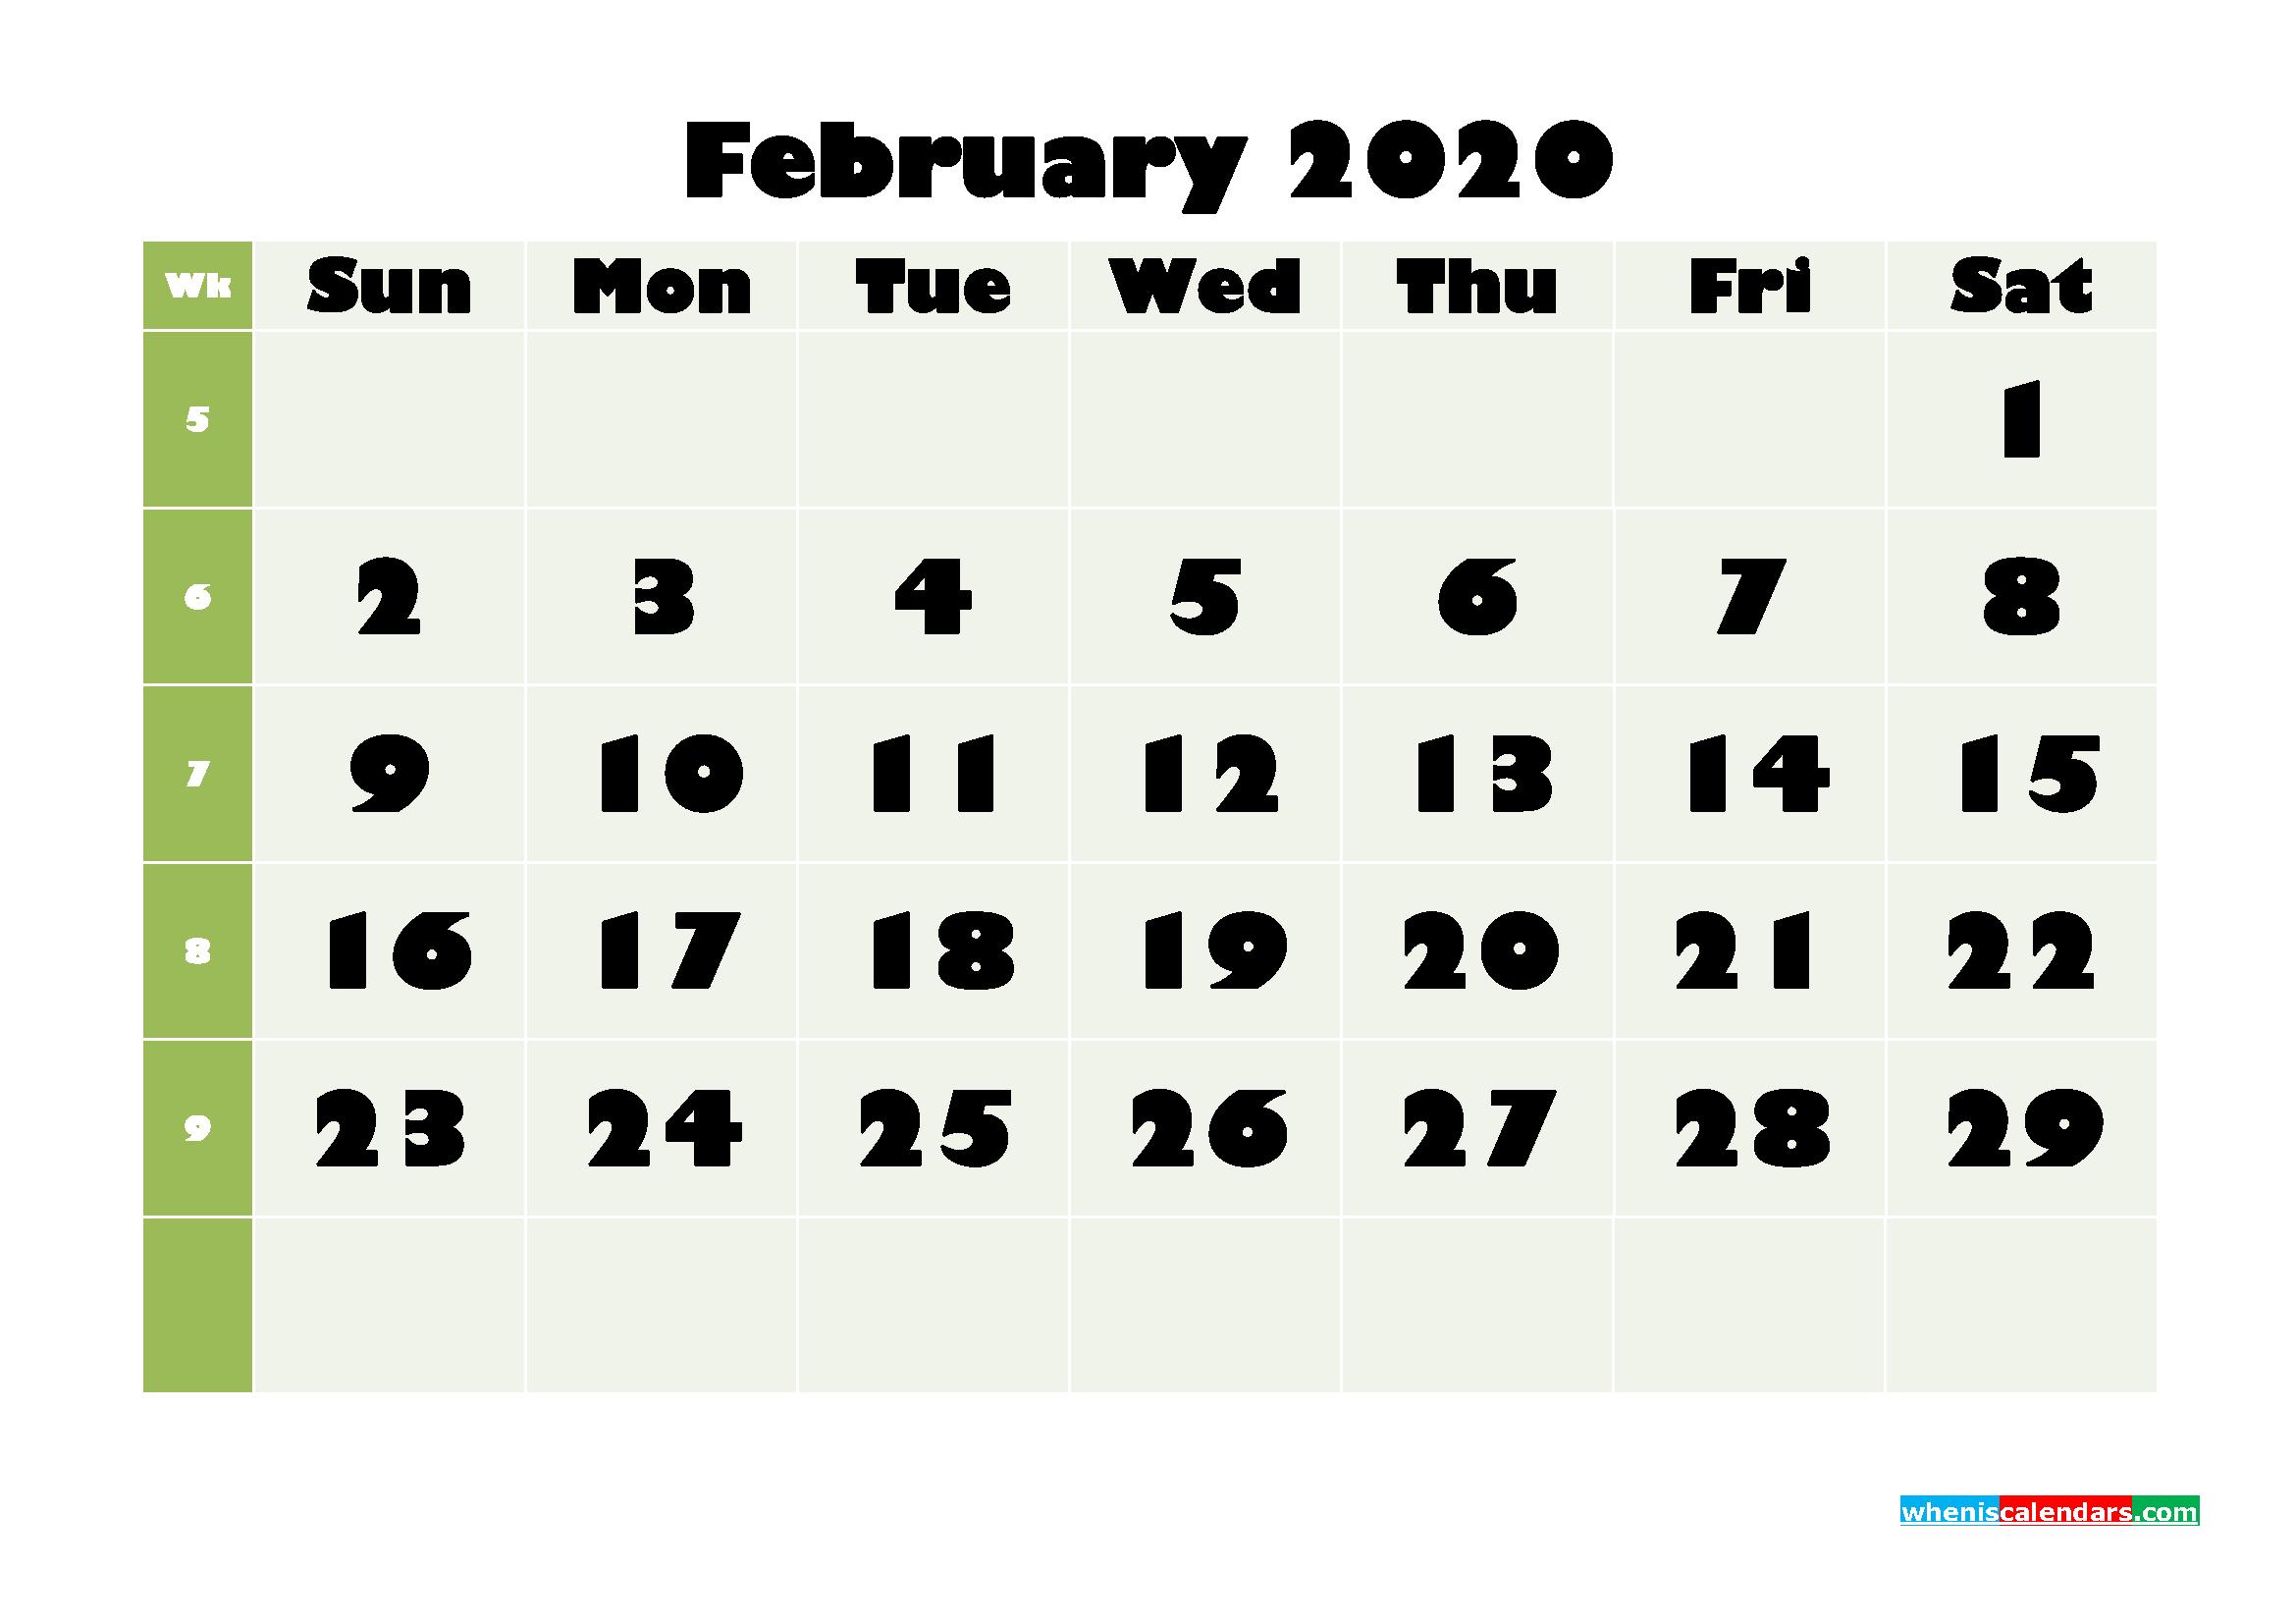 February Printable Calendar 2020 PDF, Word - No.m20b662